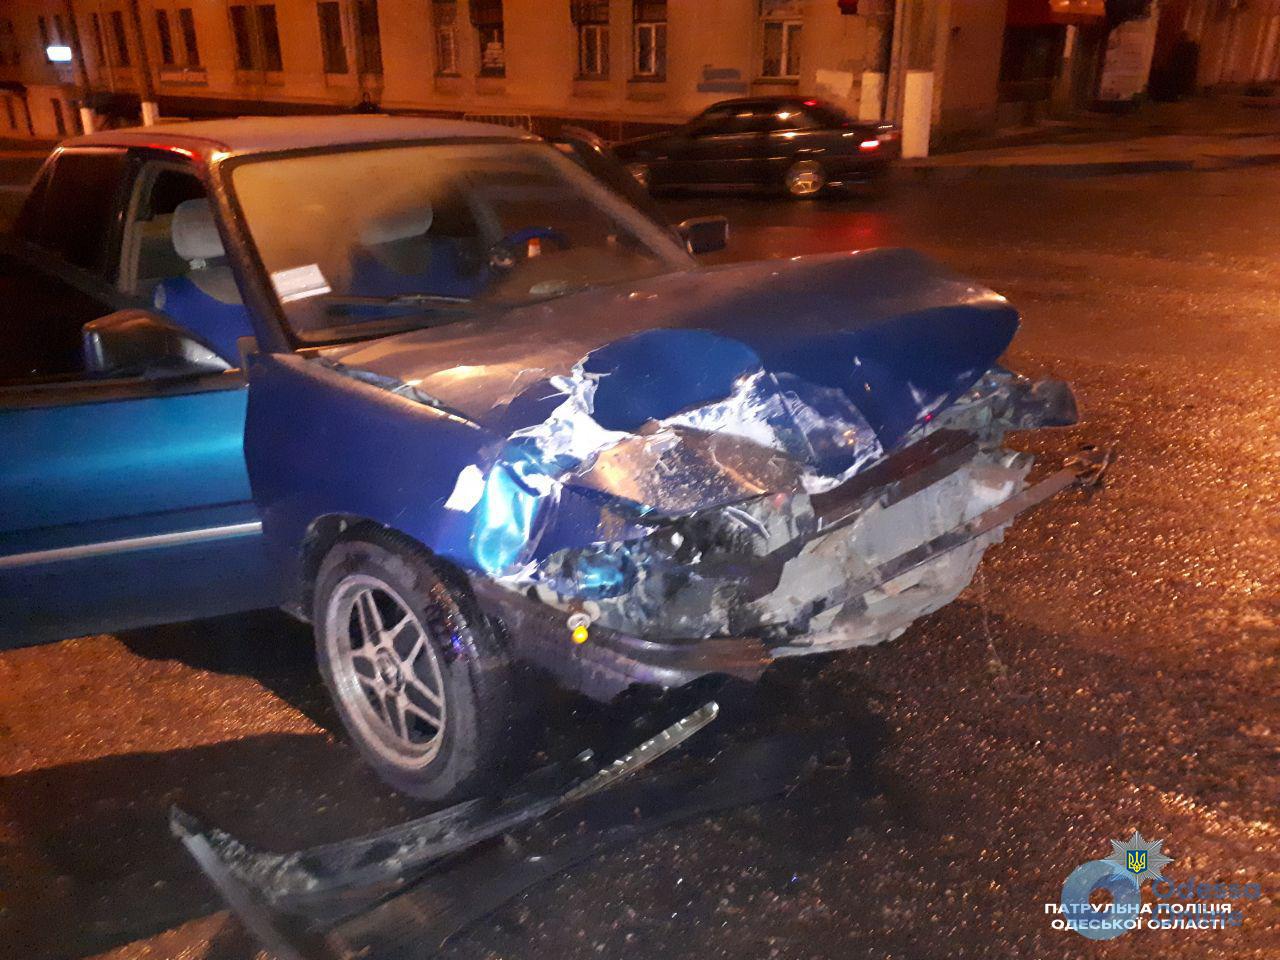 Одесса: лихач взял на таран карету скорой помощи